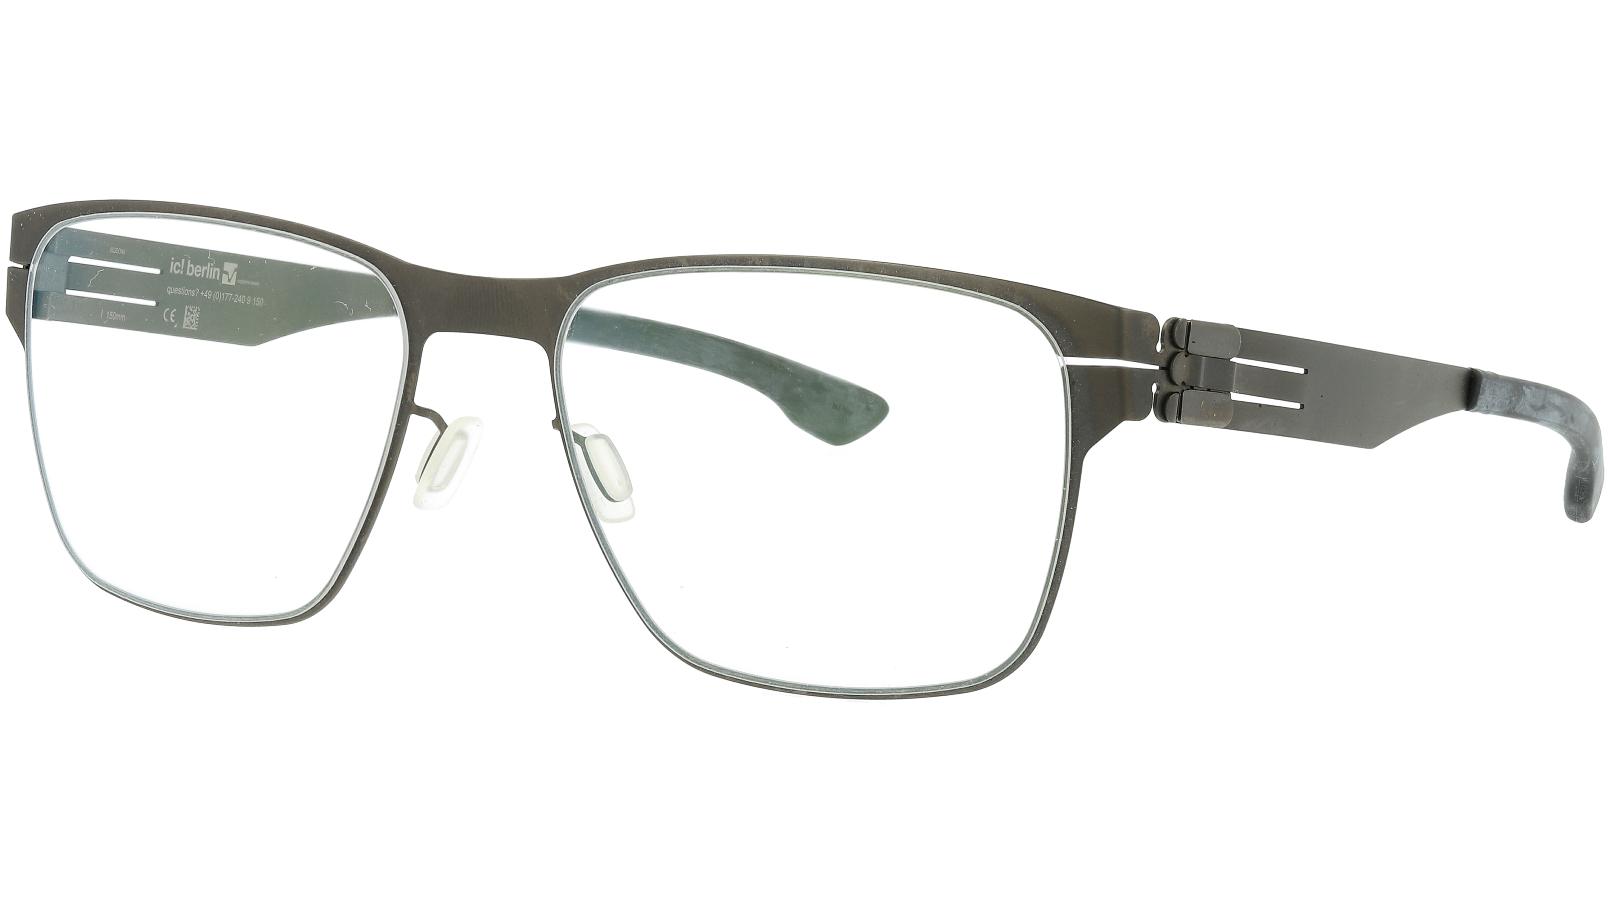 ic! berlin Hannes S Graphite Grey Glasses